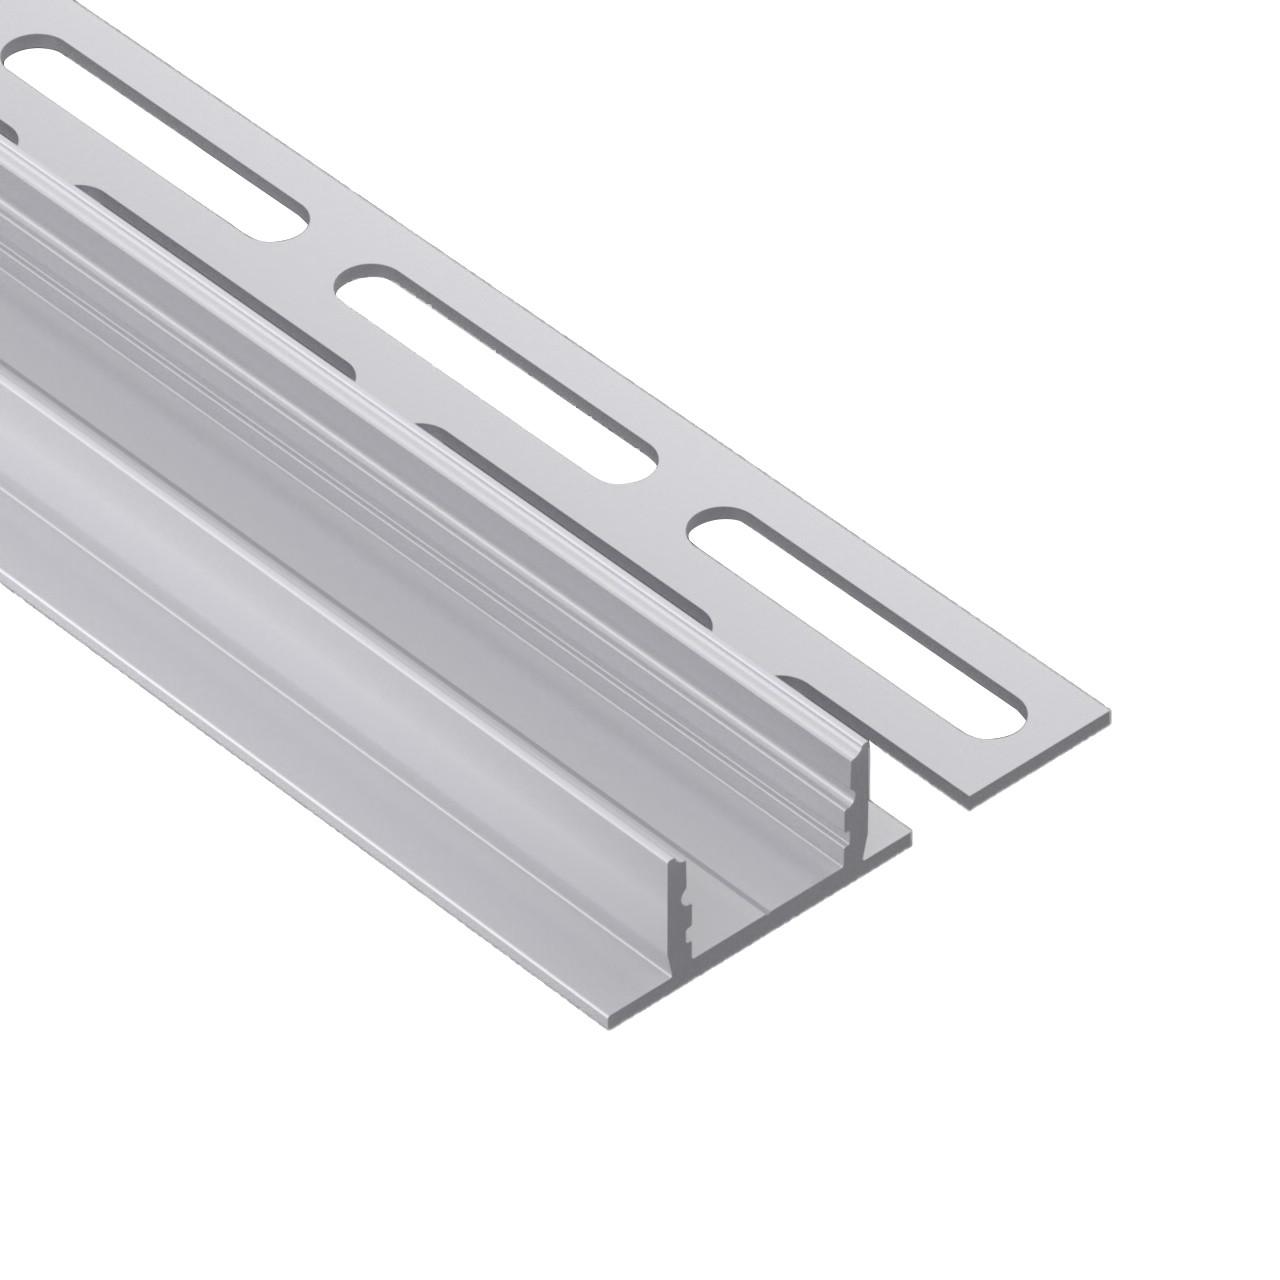 CT1 Tile Flat End Edge Led Profile